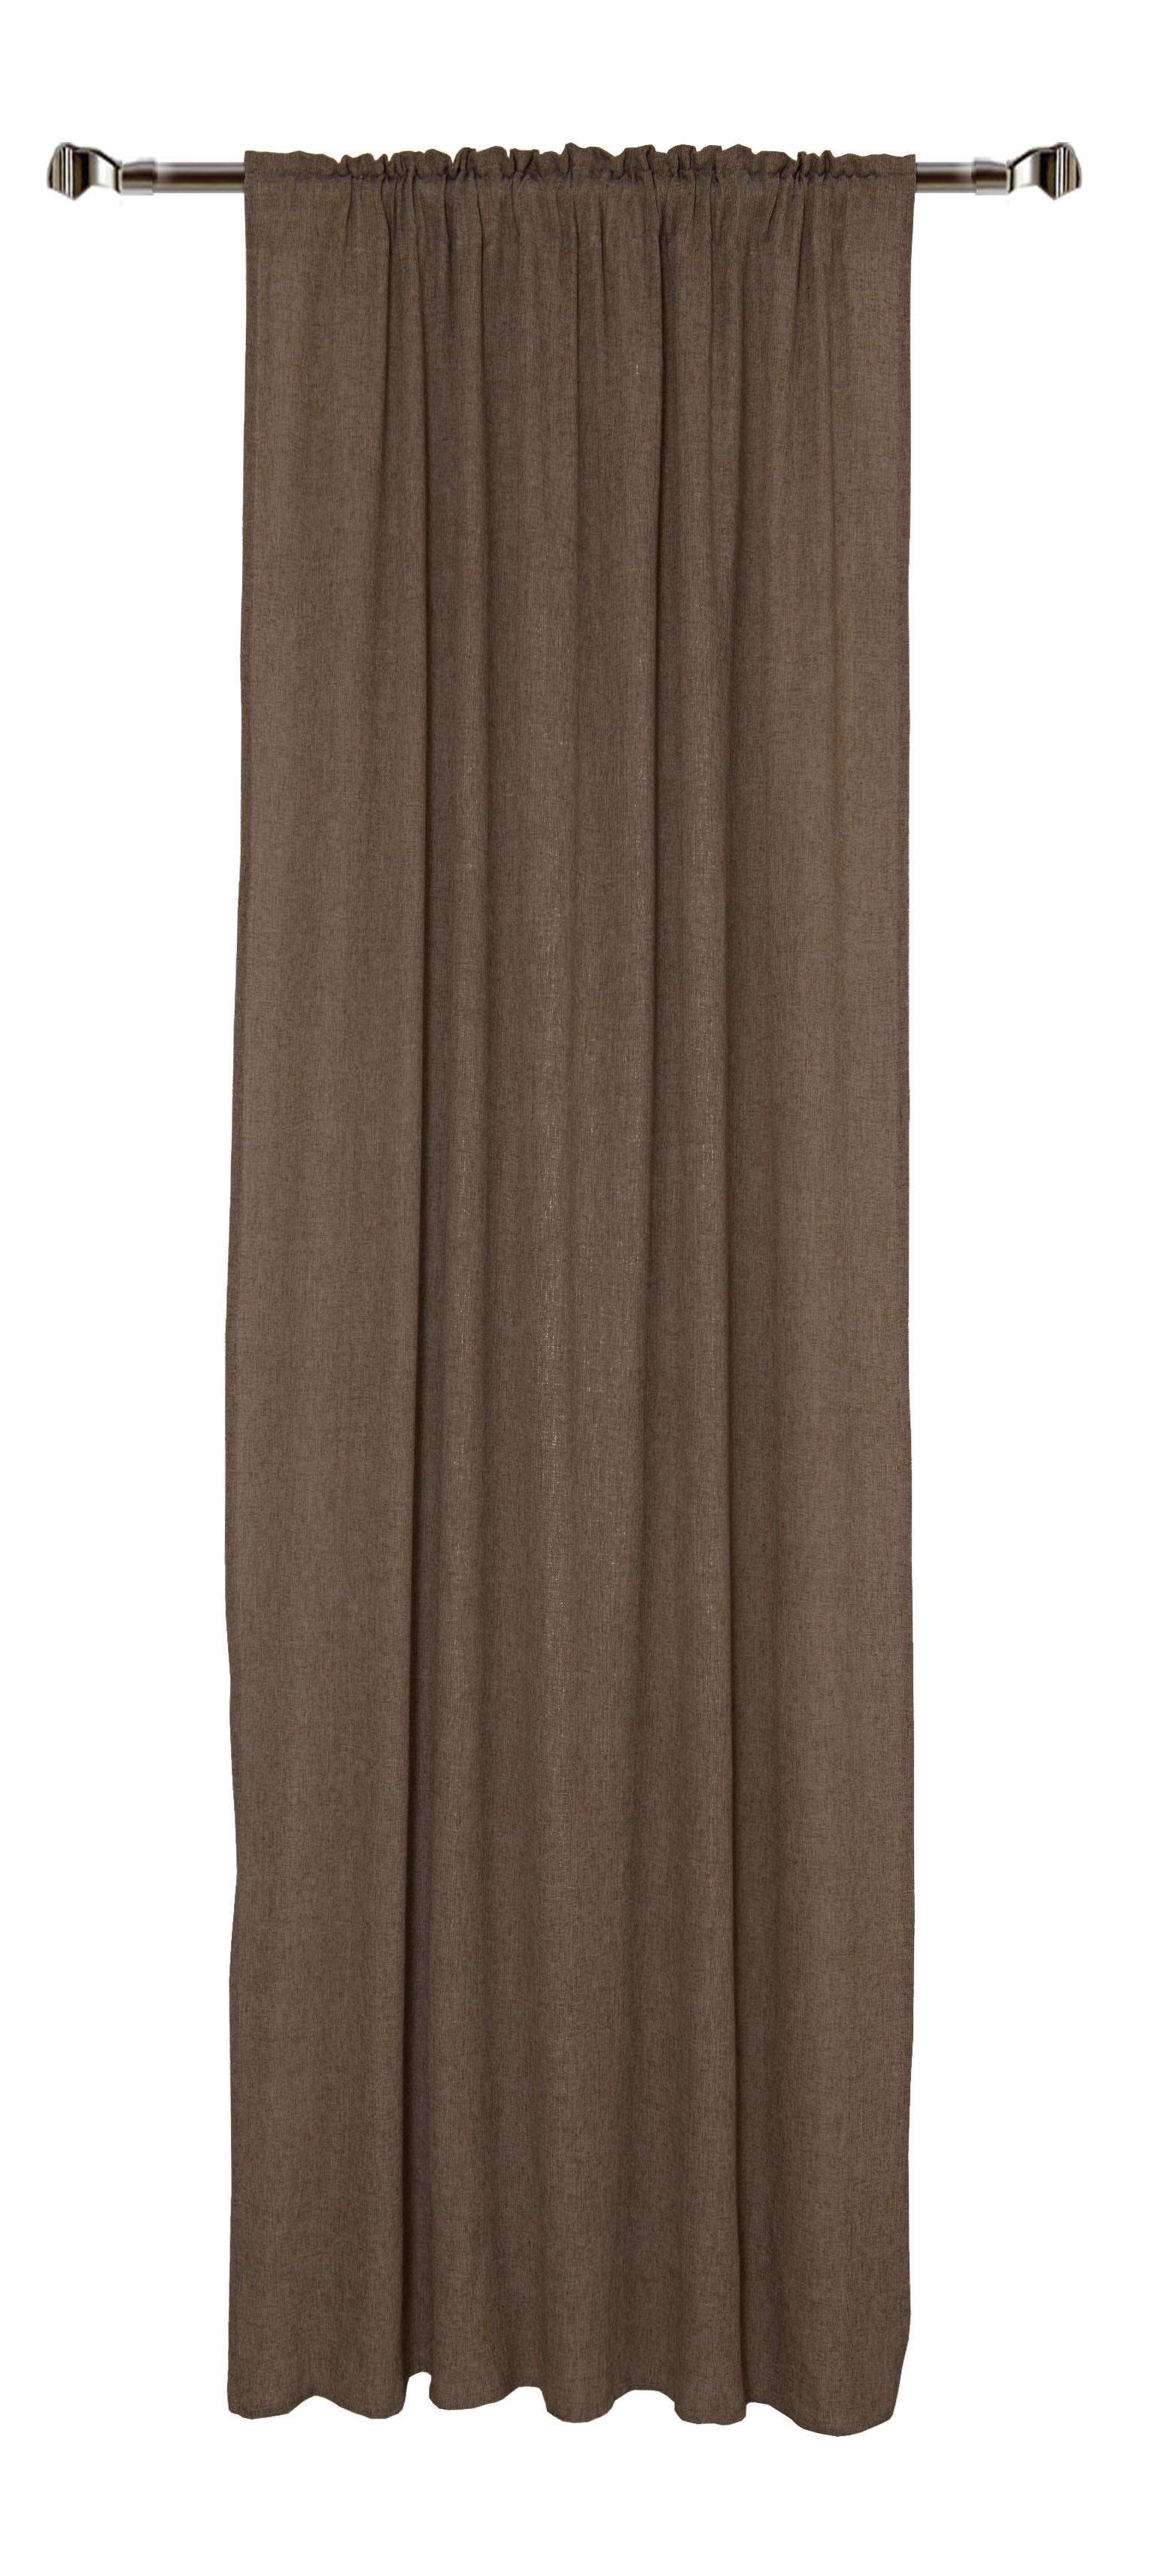 Draperie Home RM-KS760-04 Brown 140 x 270 cm 1 bucata